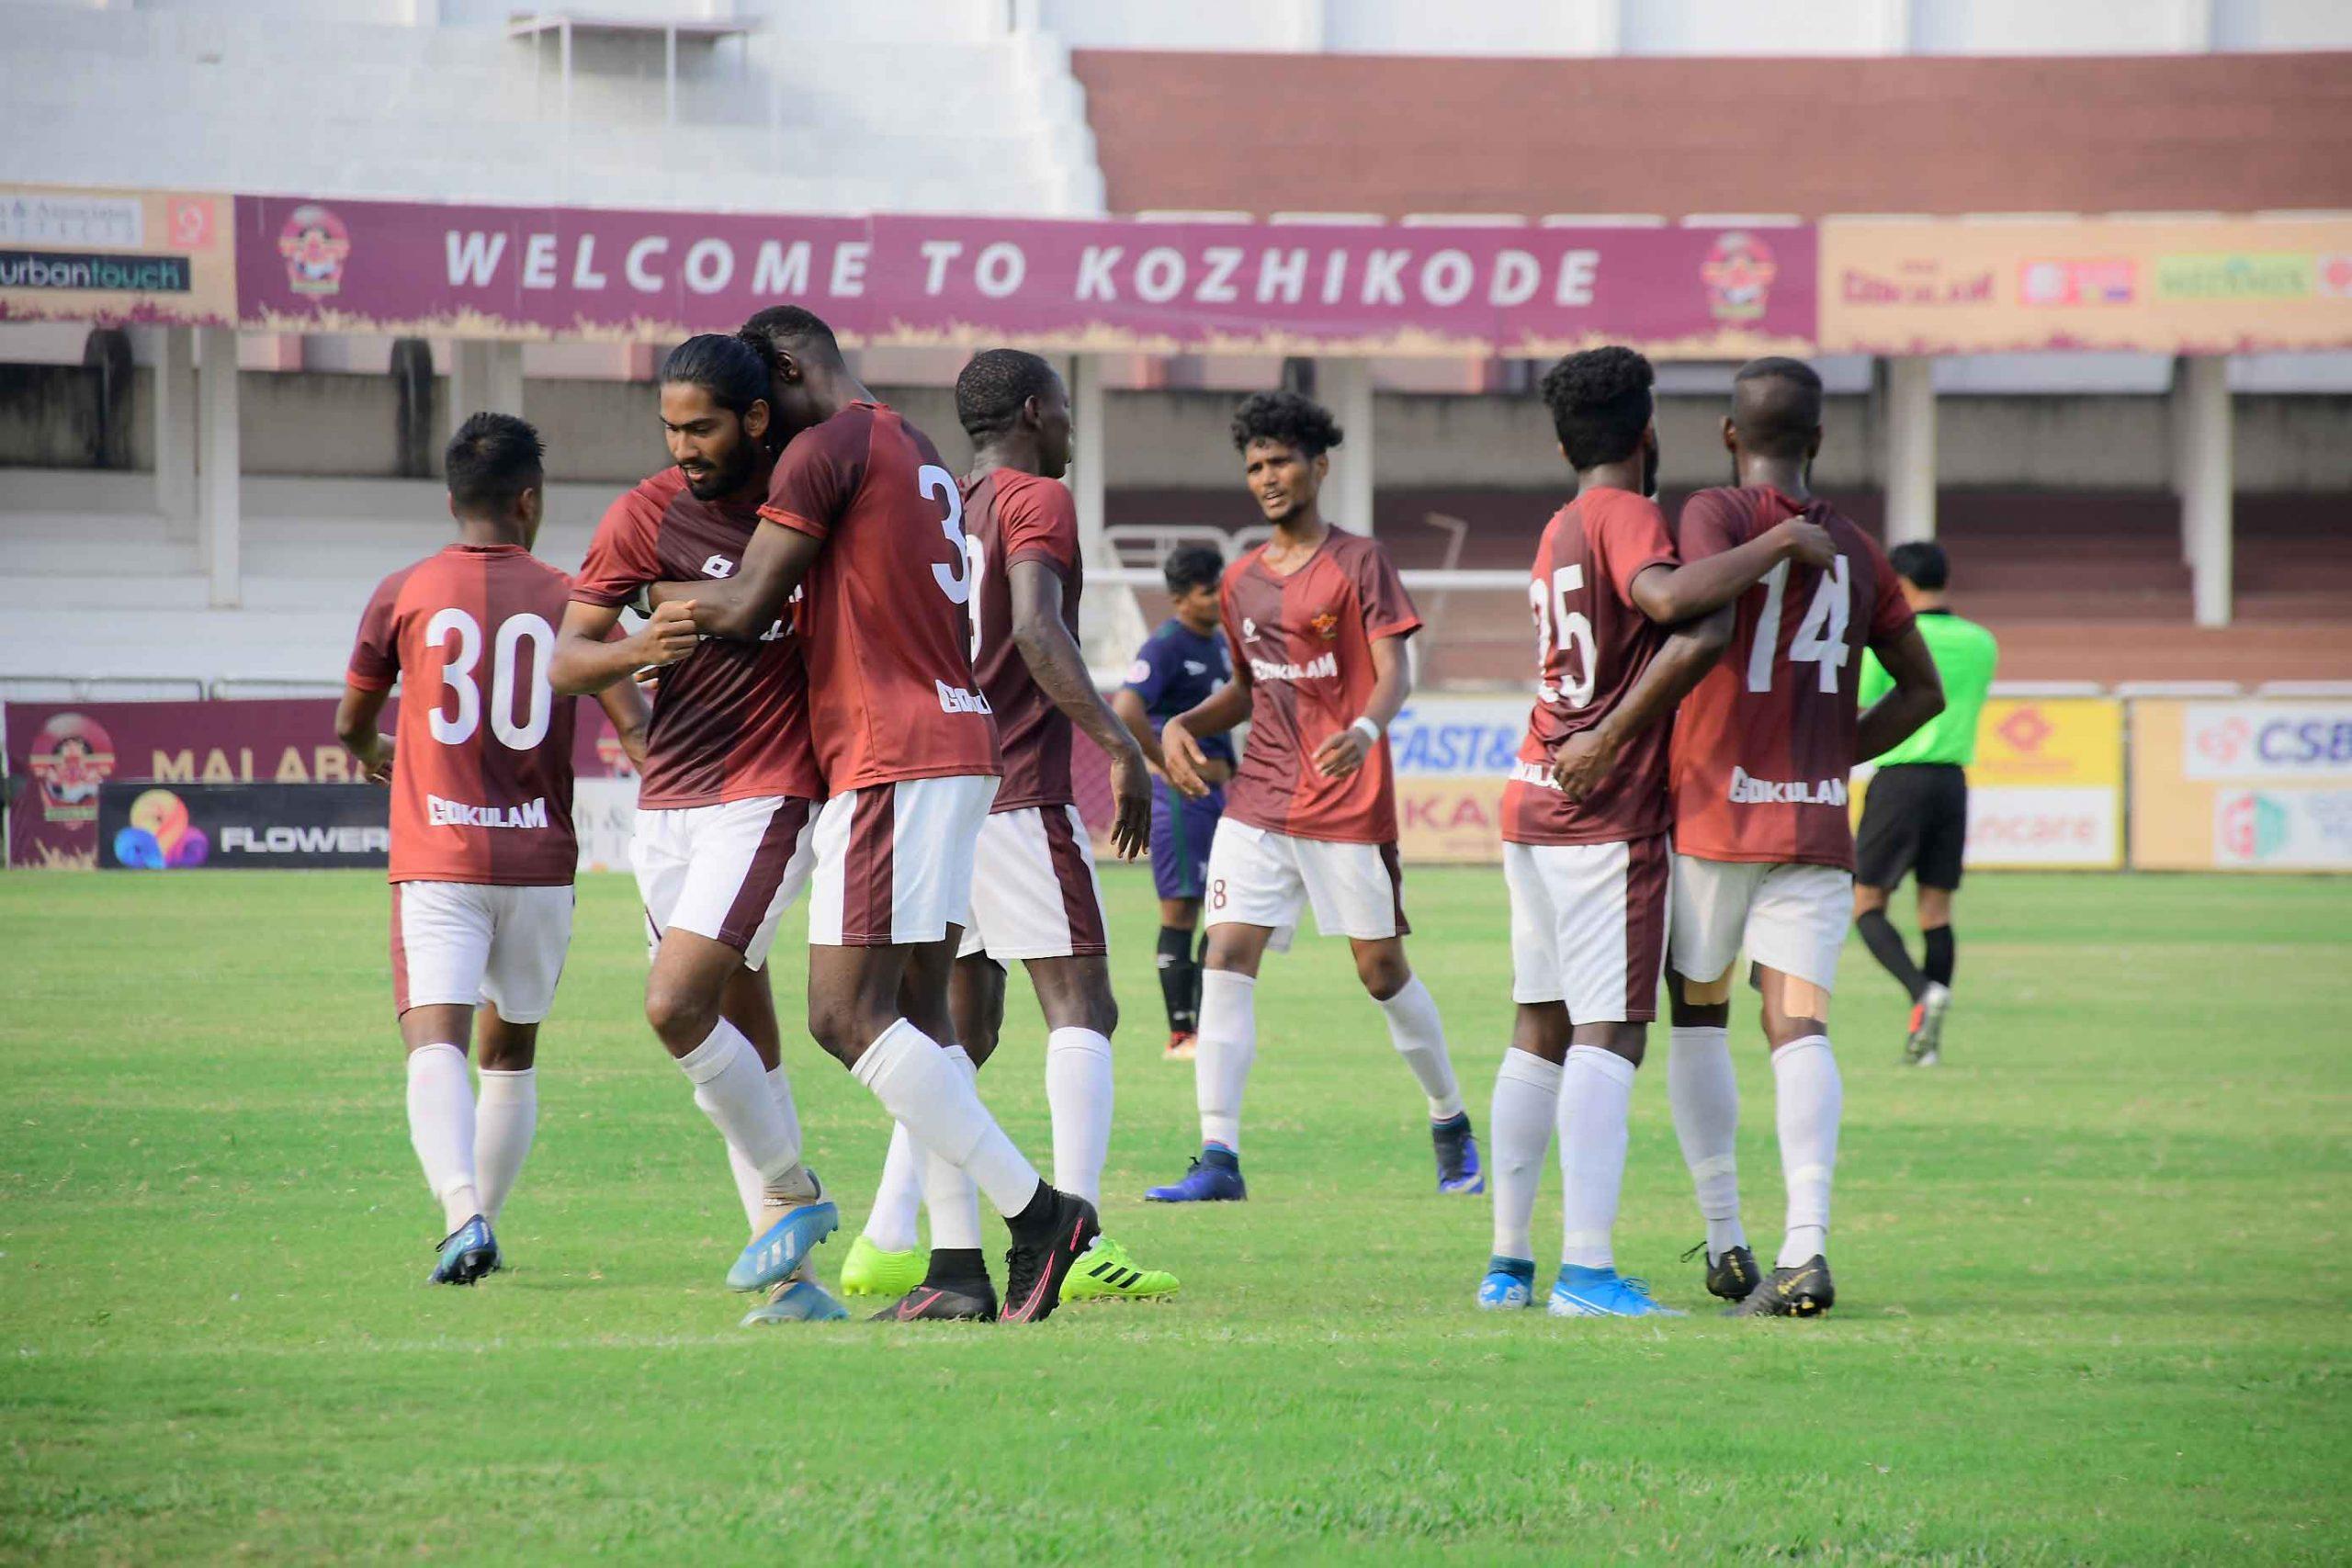 Gokulam Kerala FC blank Kerala Police, enter the final of KPL